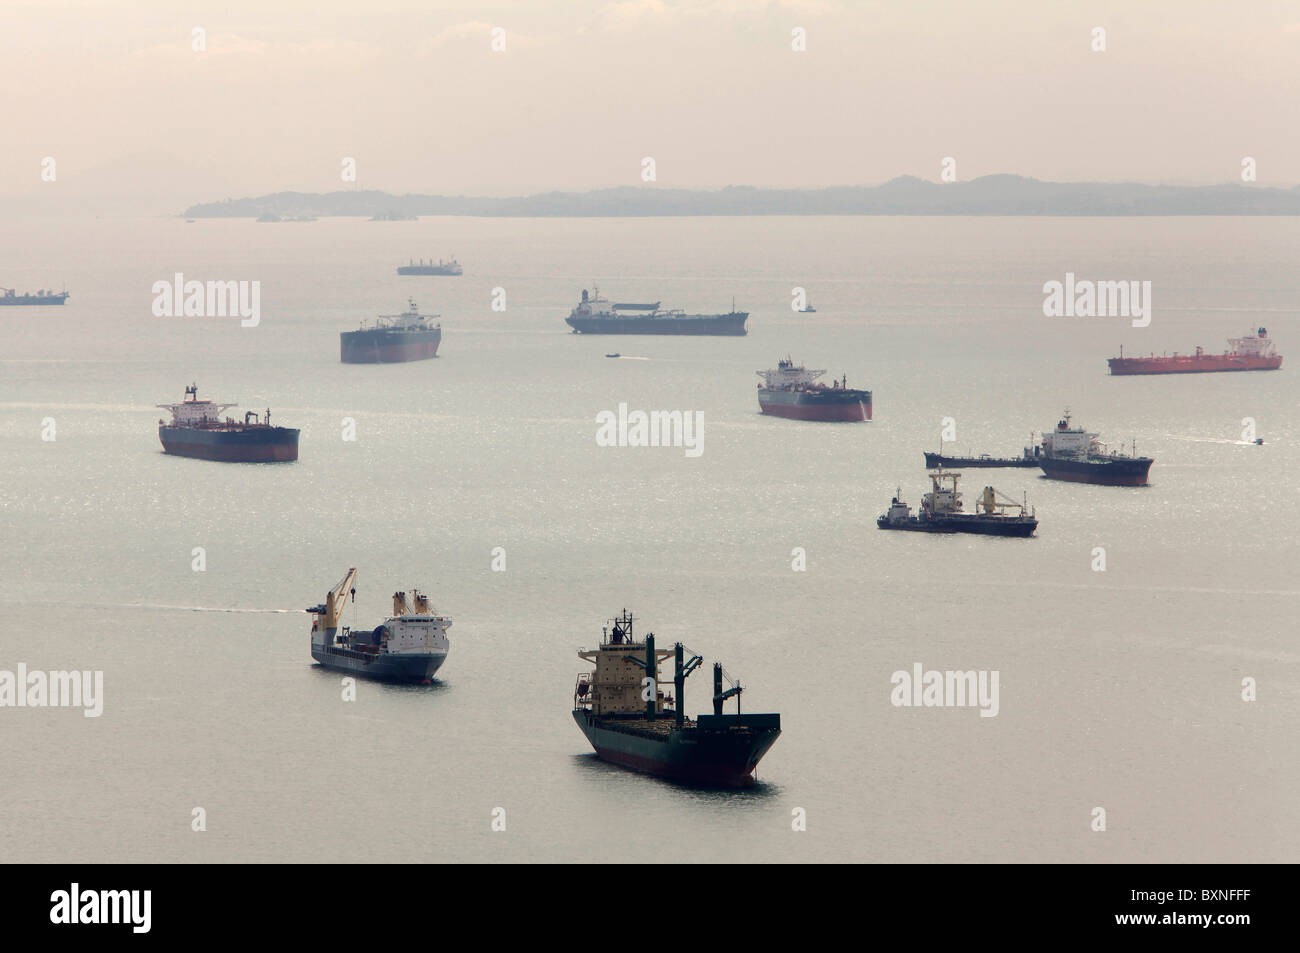 Ships waiting off shore of Singapore harbor, waiting to dock - Stock Image